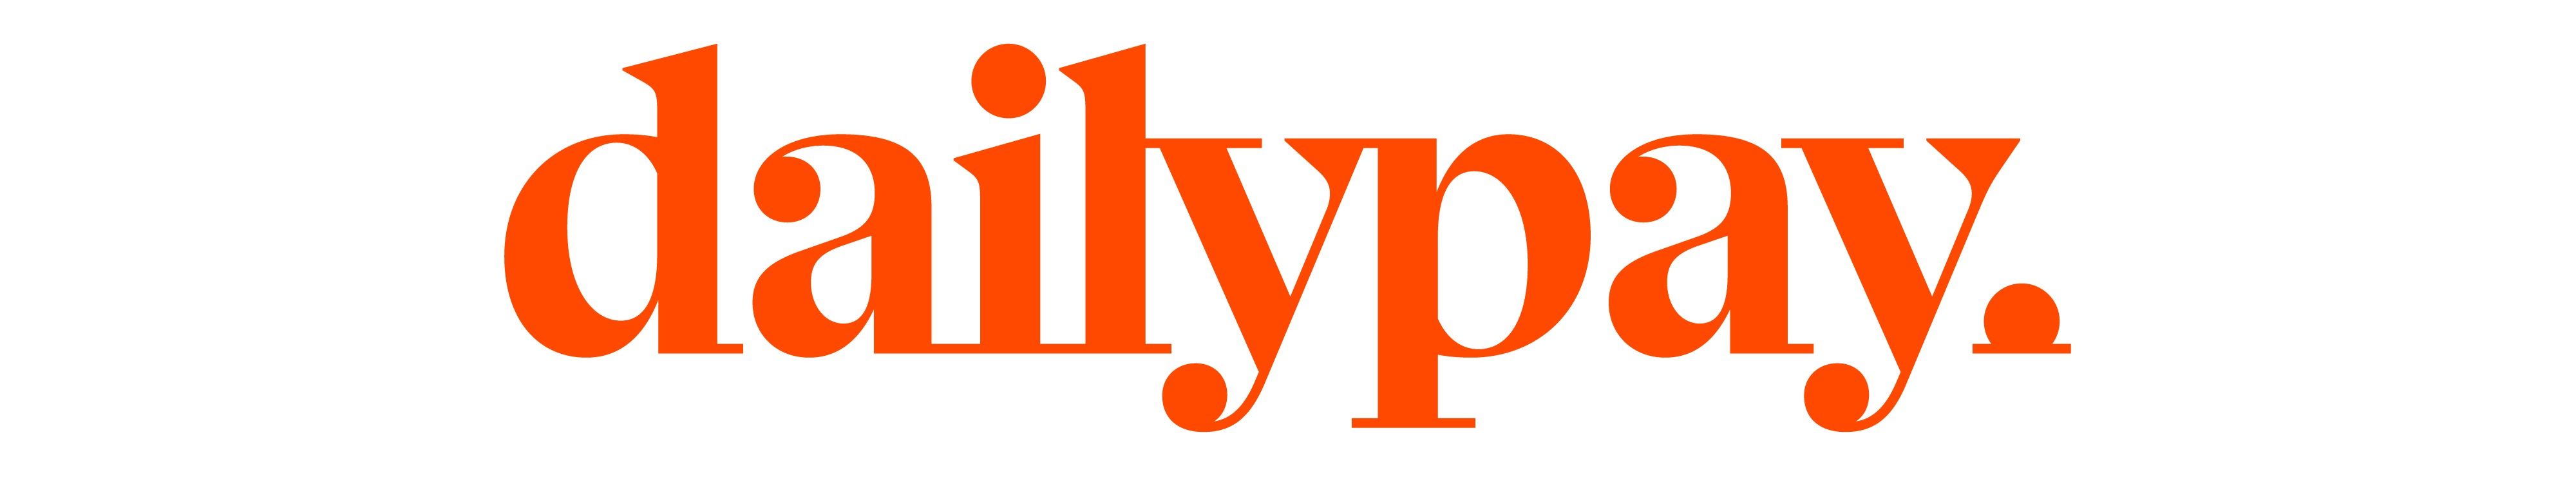 DailyPay-Wordmark-RGB-Orange (2)